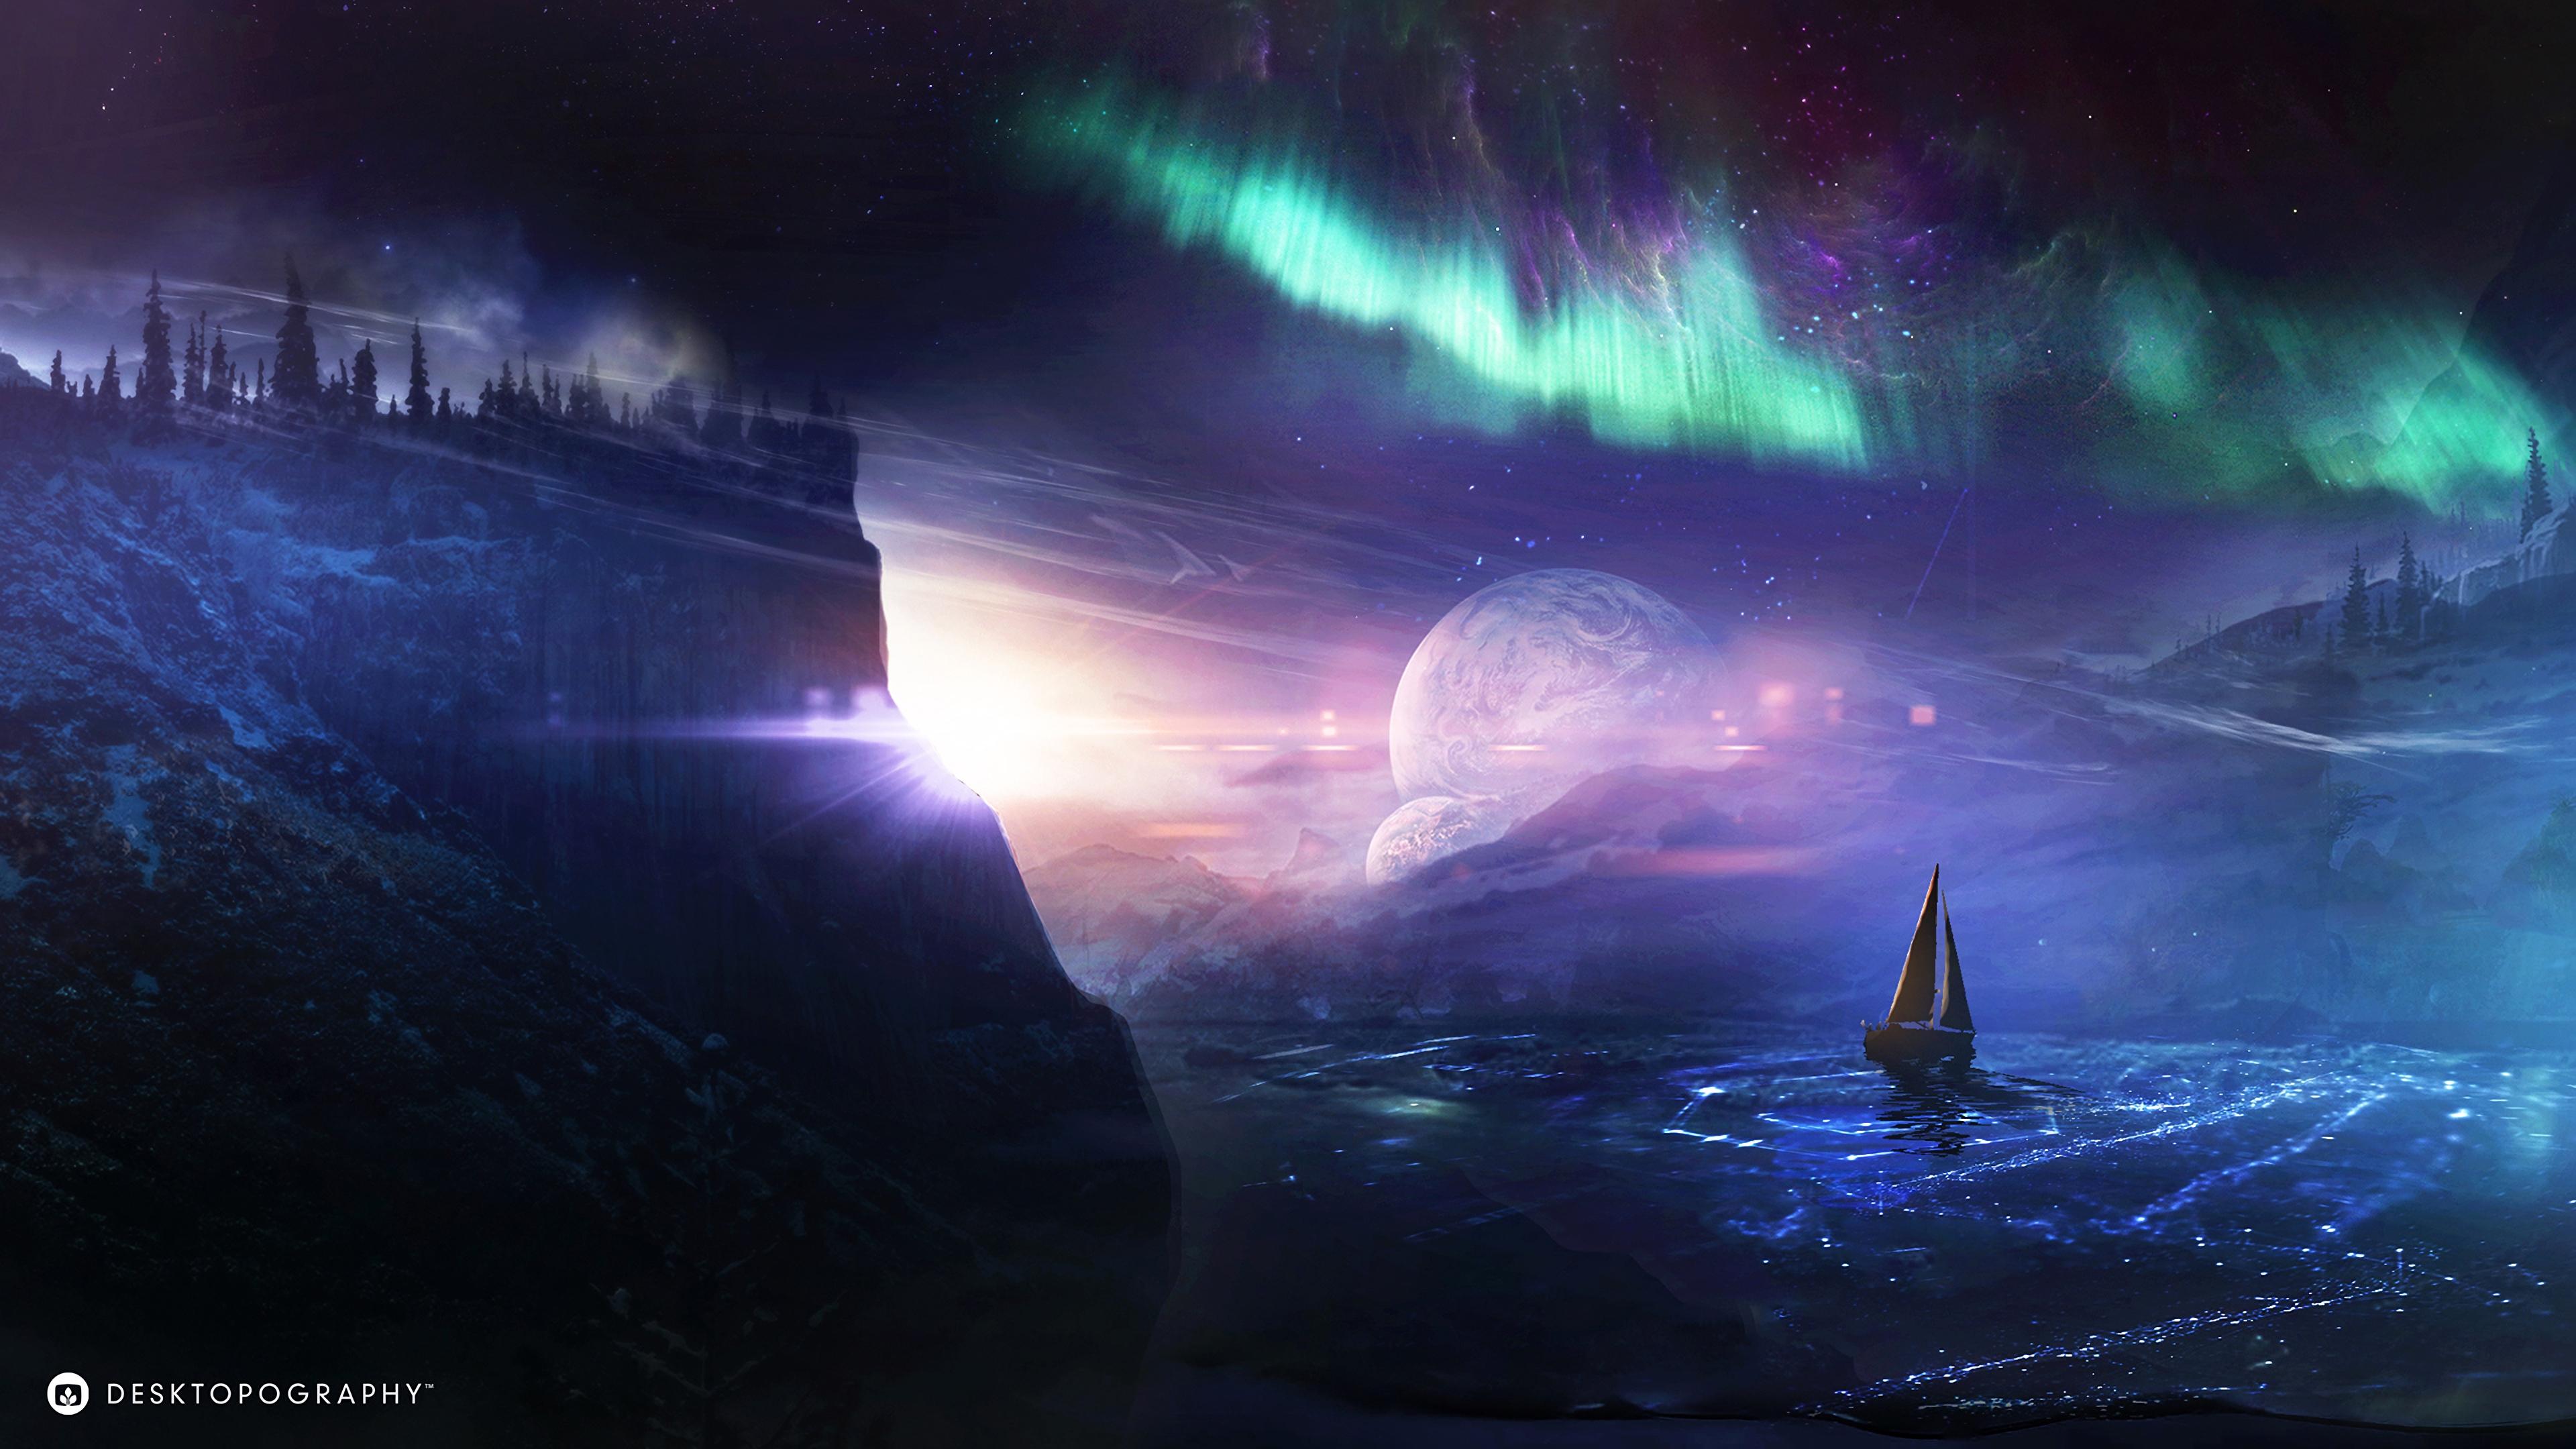 boat planet northern lights art night 4k 1541971169 - boat, planet, northern lights, art, night 4k - Planet, northern lights, Boat